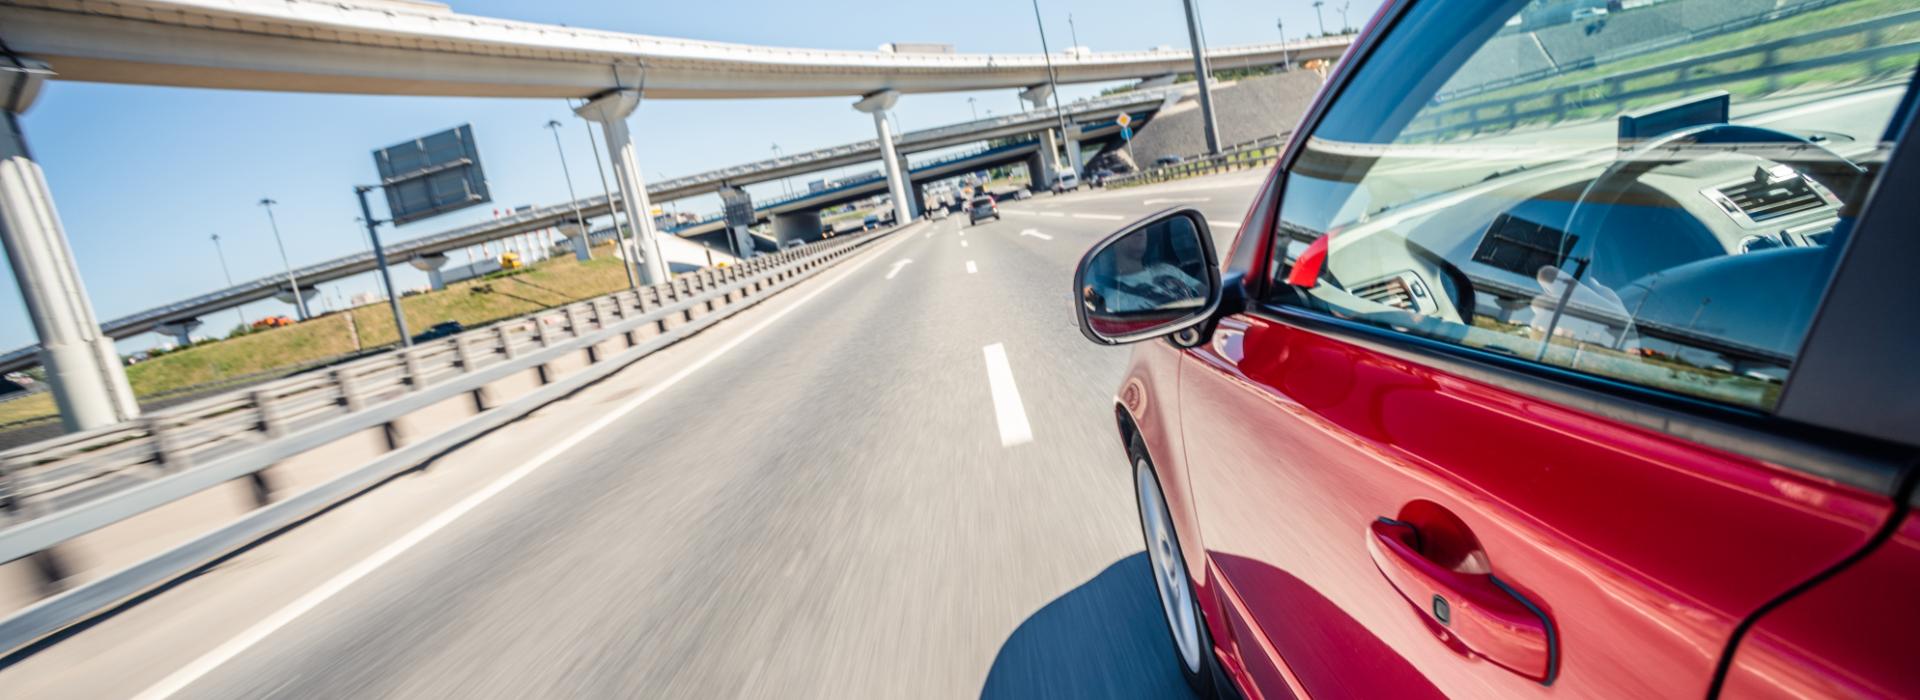 Red car speeding down the highway.